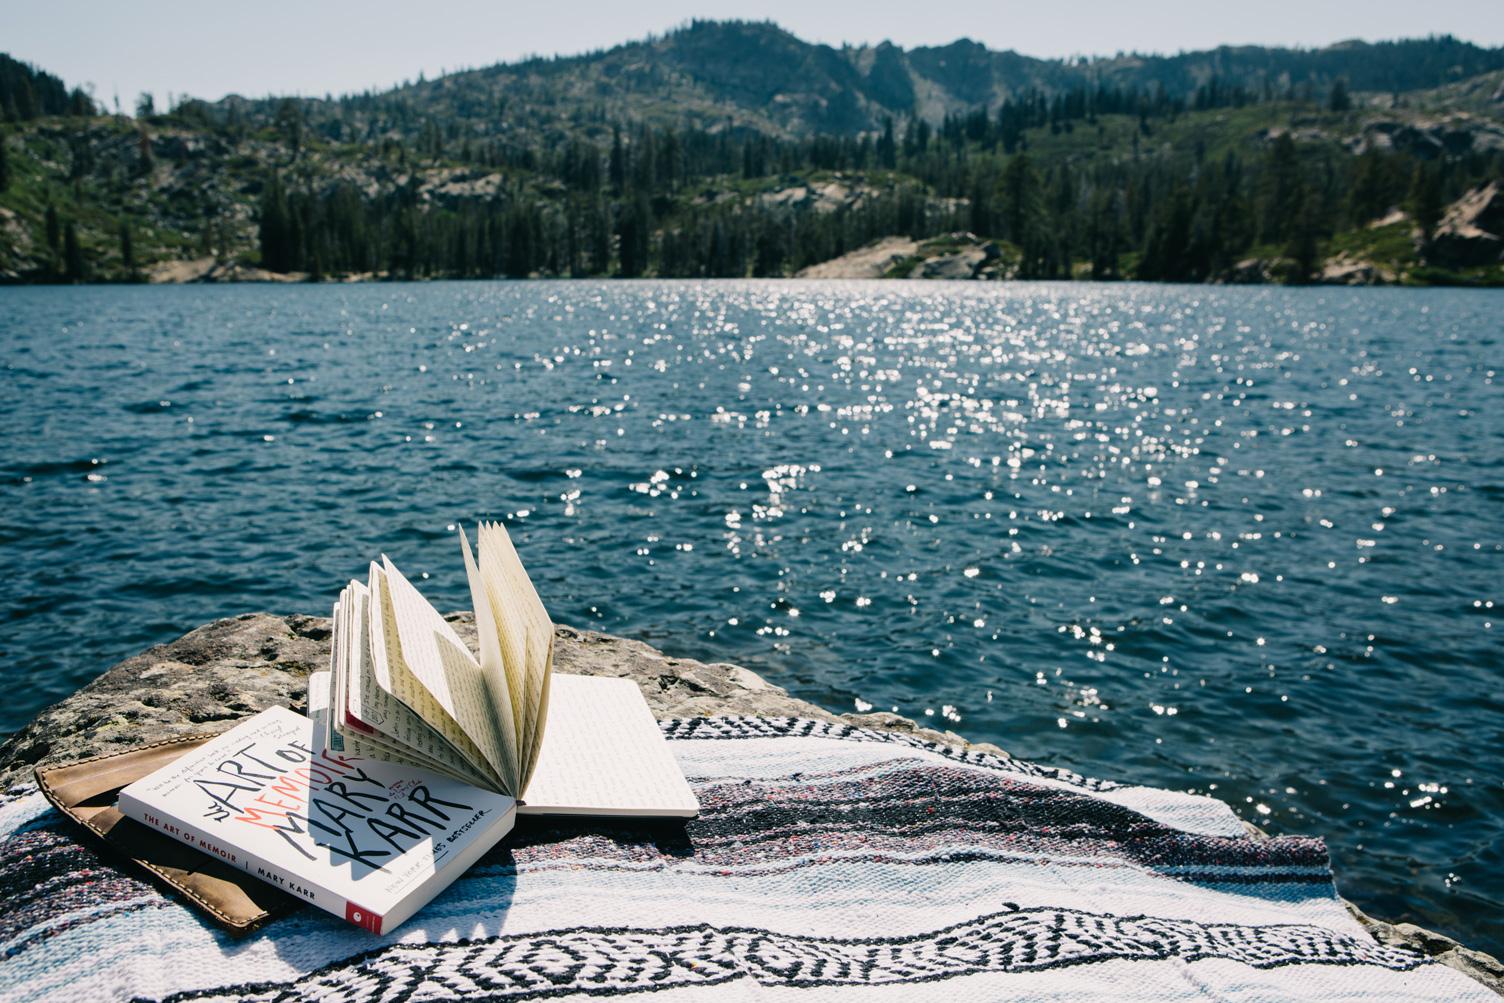 CindyGiovagnoli_outdoors_photographer_Sierra_Buttes_firetower_watchtower_Sardine_Snag_Bear_lake_hike_swim_camp-058.jpg